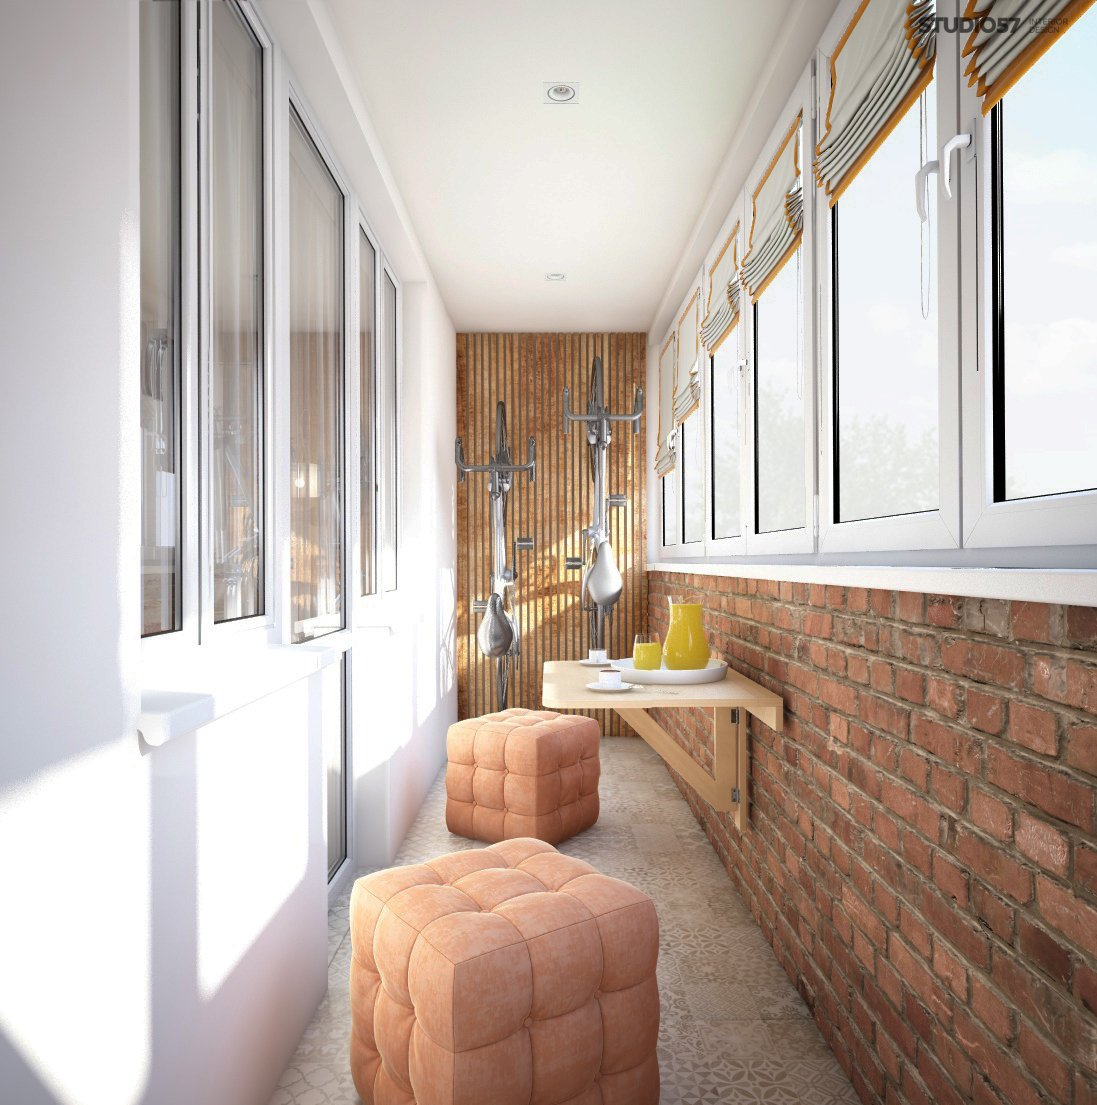 Image of the balcony design